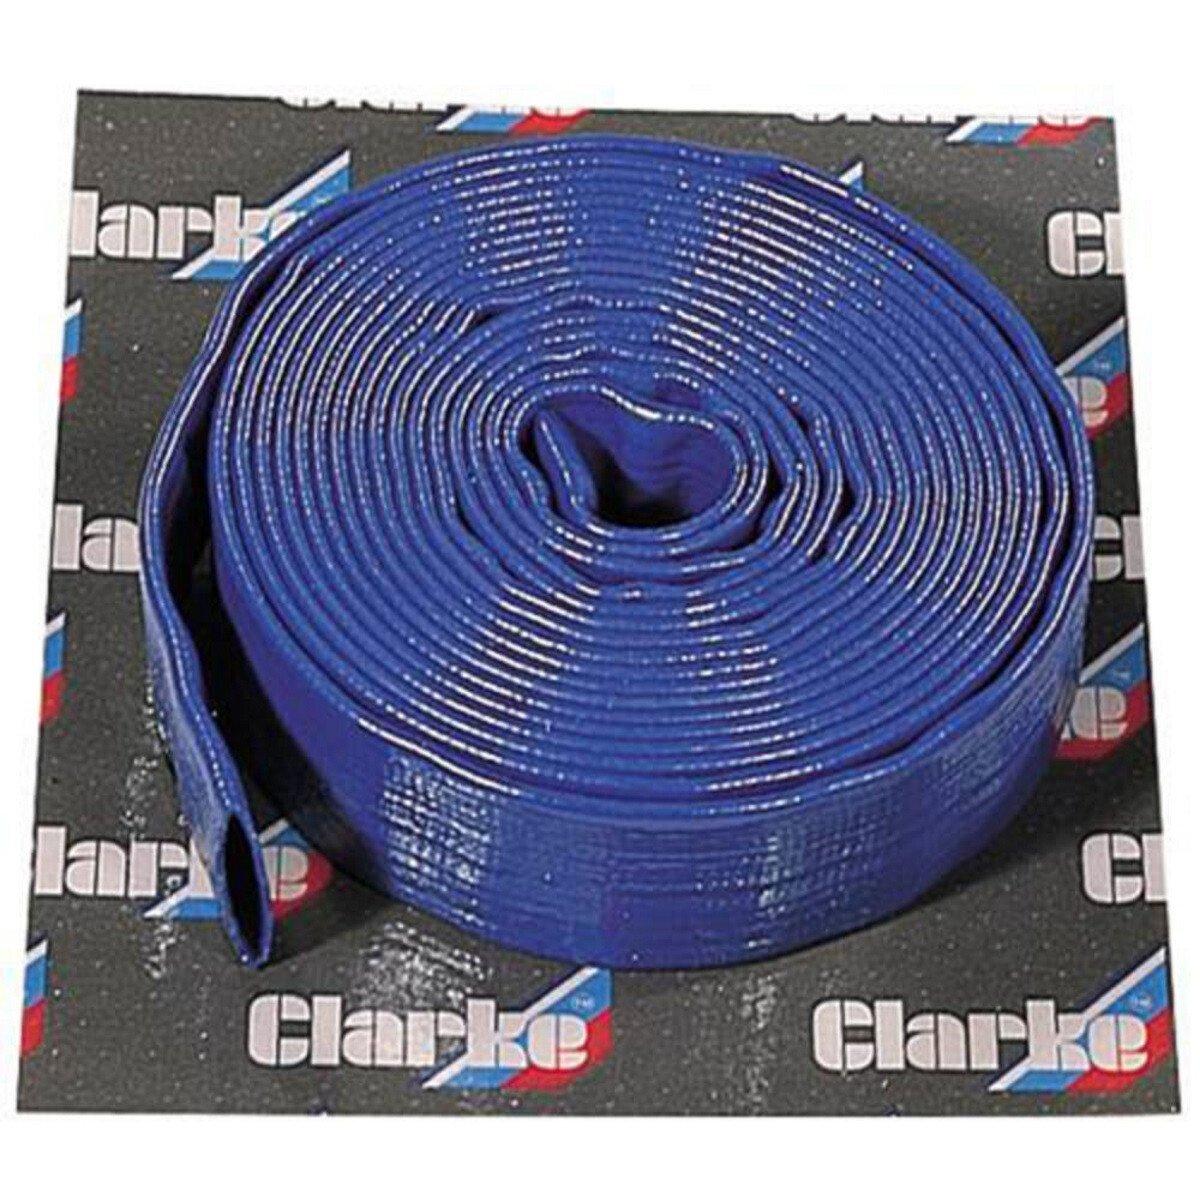 "Clarke 7955155 10m x 1.1/2"" (38mm) Diameter Layflat Delivery Hose"